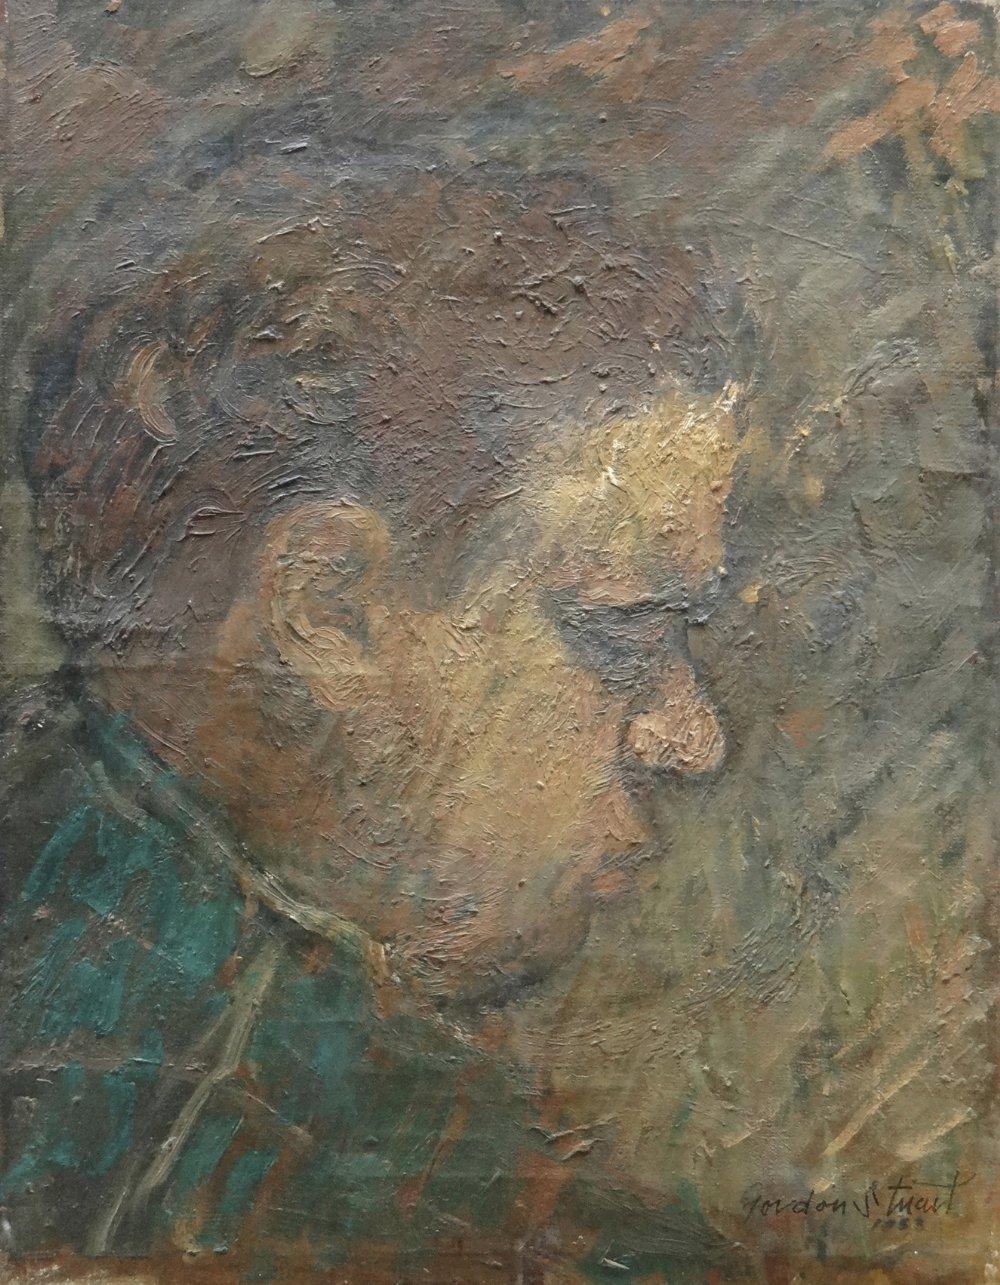 GORDON STUART oil on canvas - head and shoulders portrait of poet Dylan Thomas in side-profile,